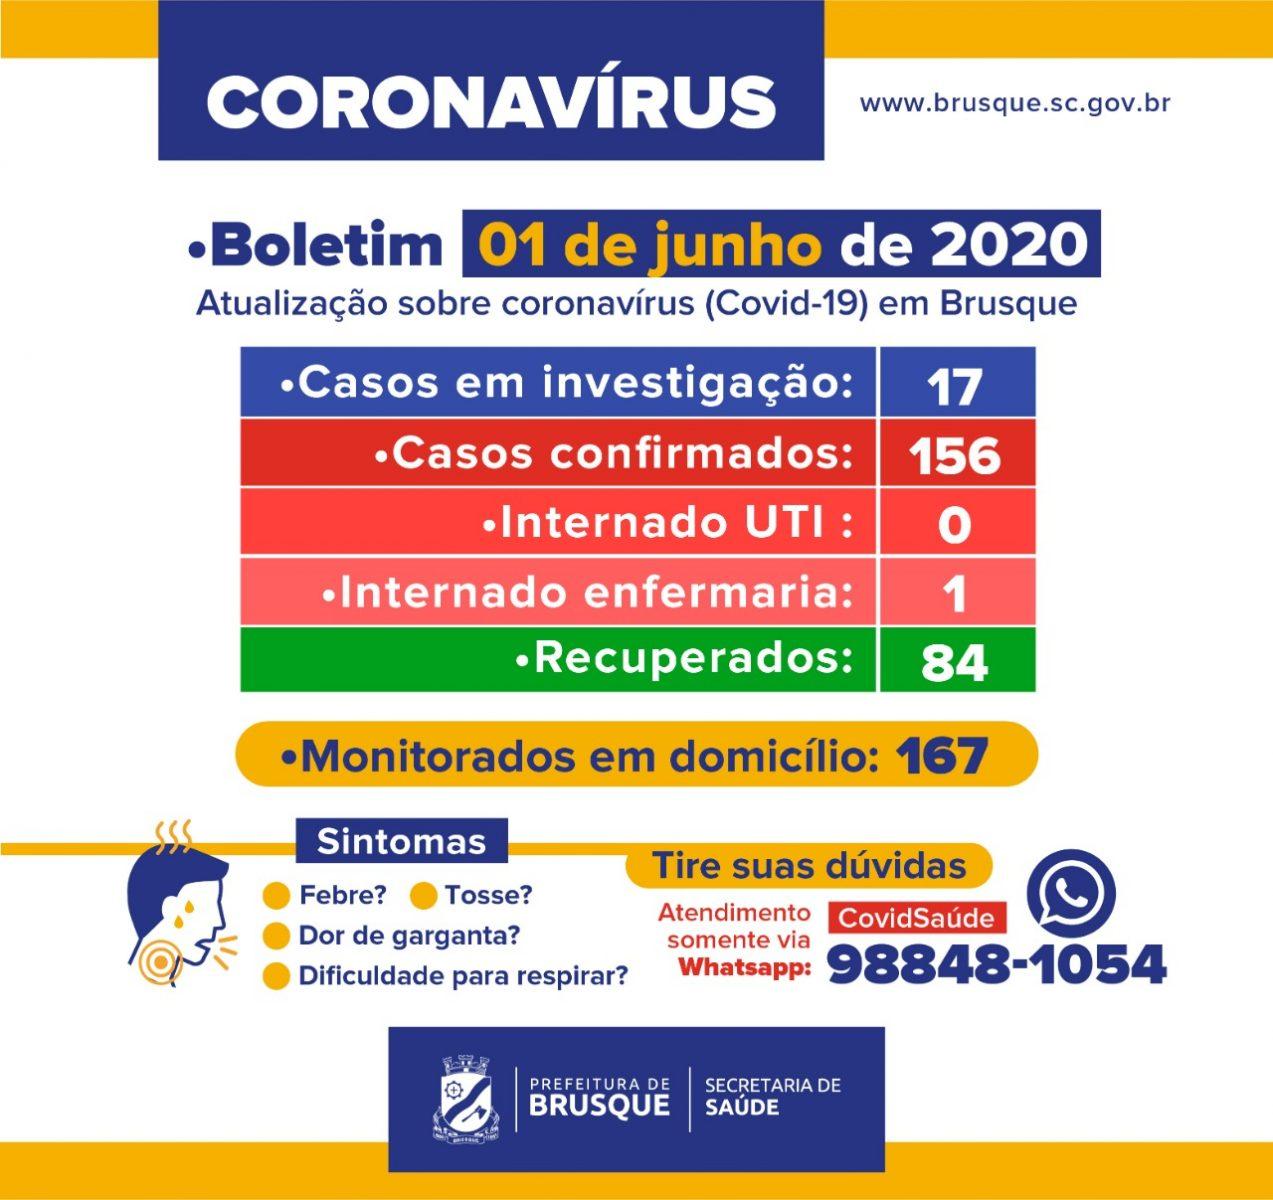 Confira o Boletim Epidemiológico da Prefeitura de Brusque desta segunda-feira (01)